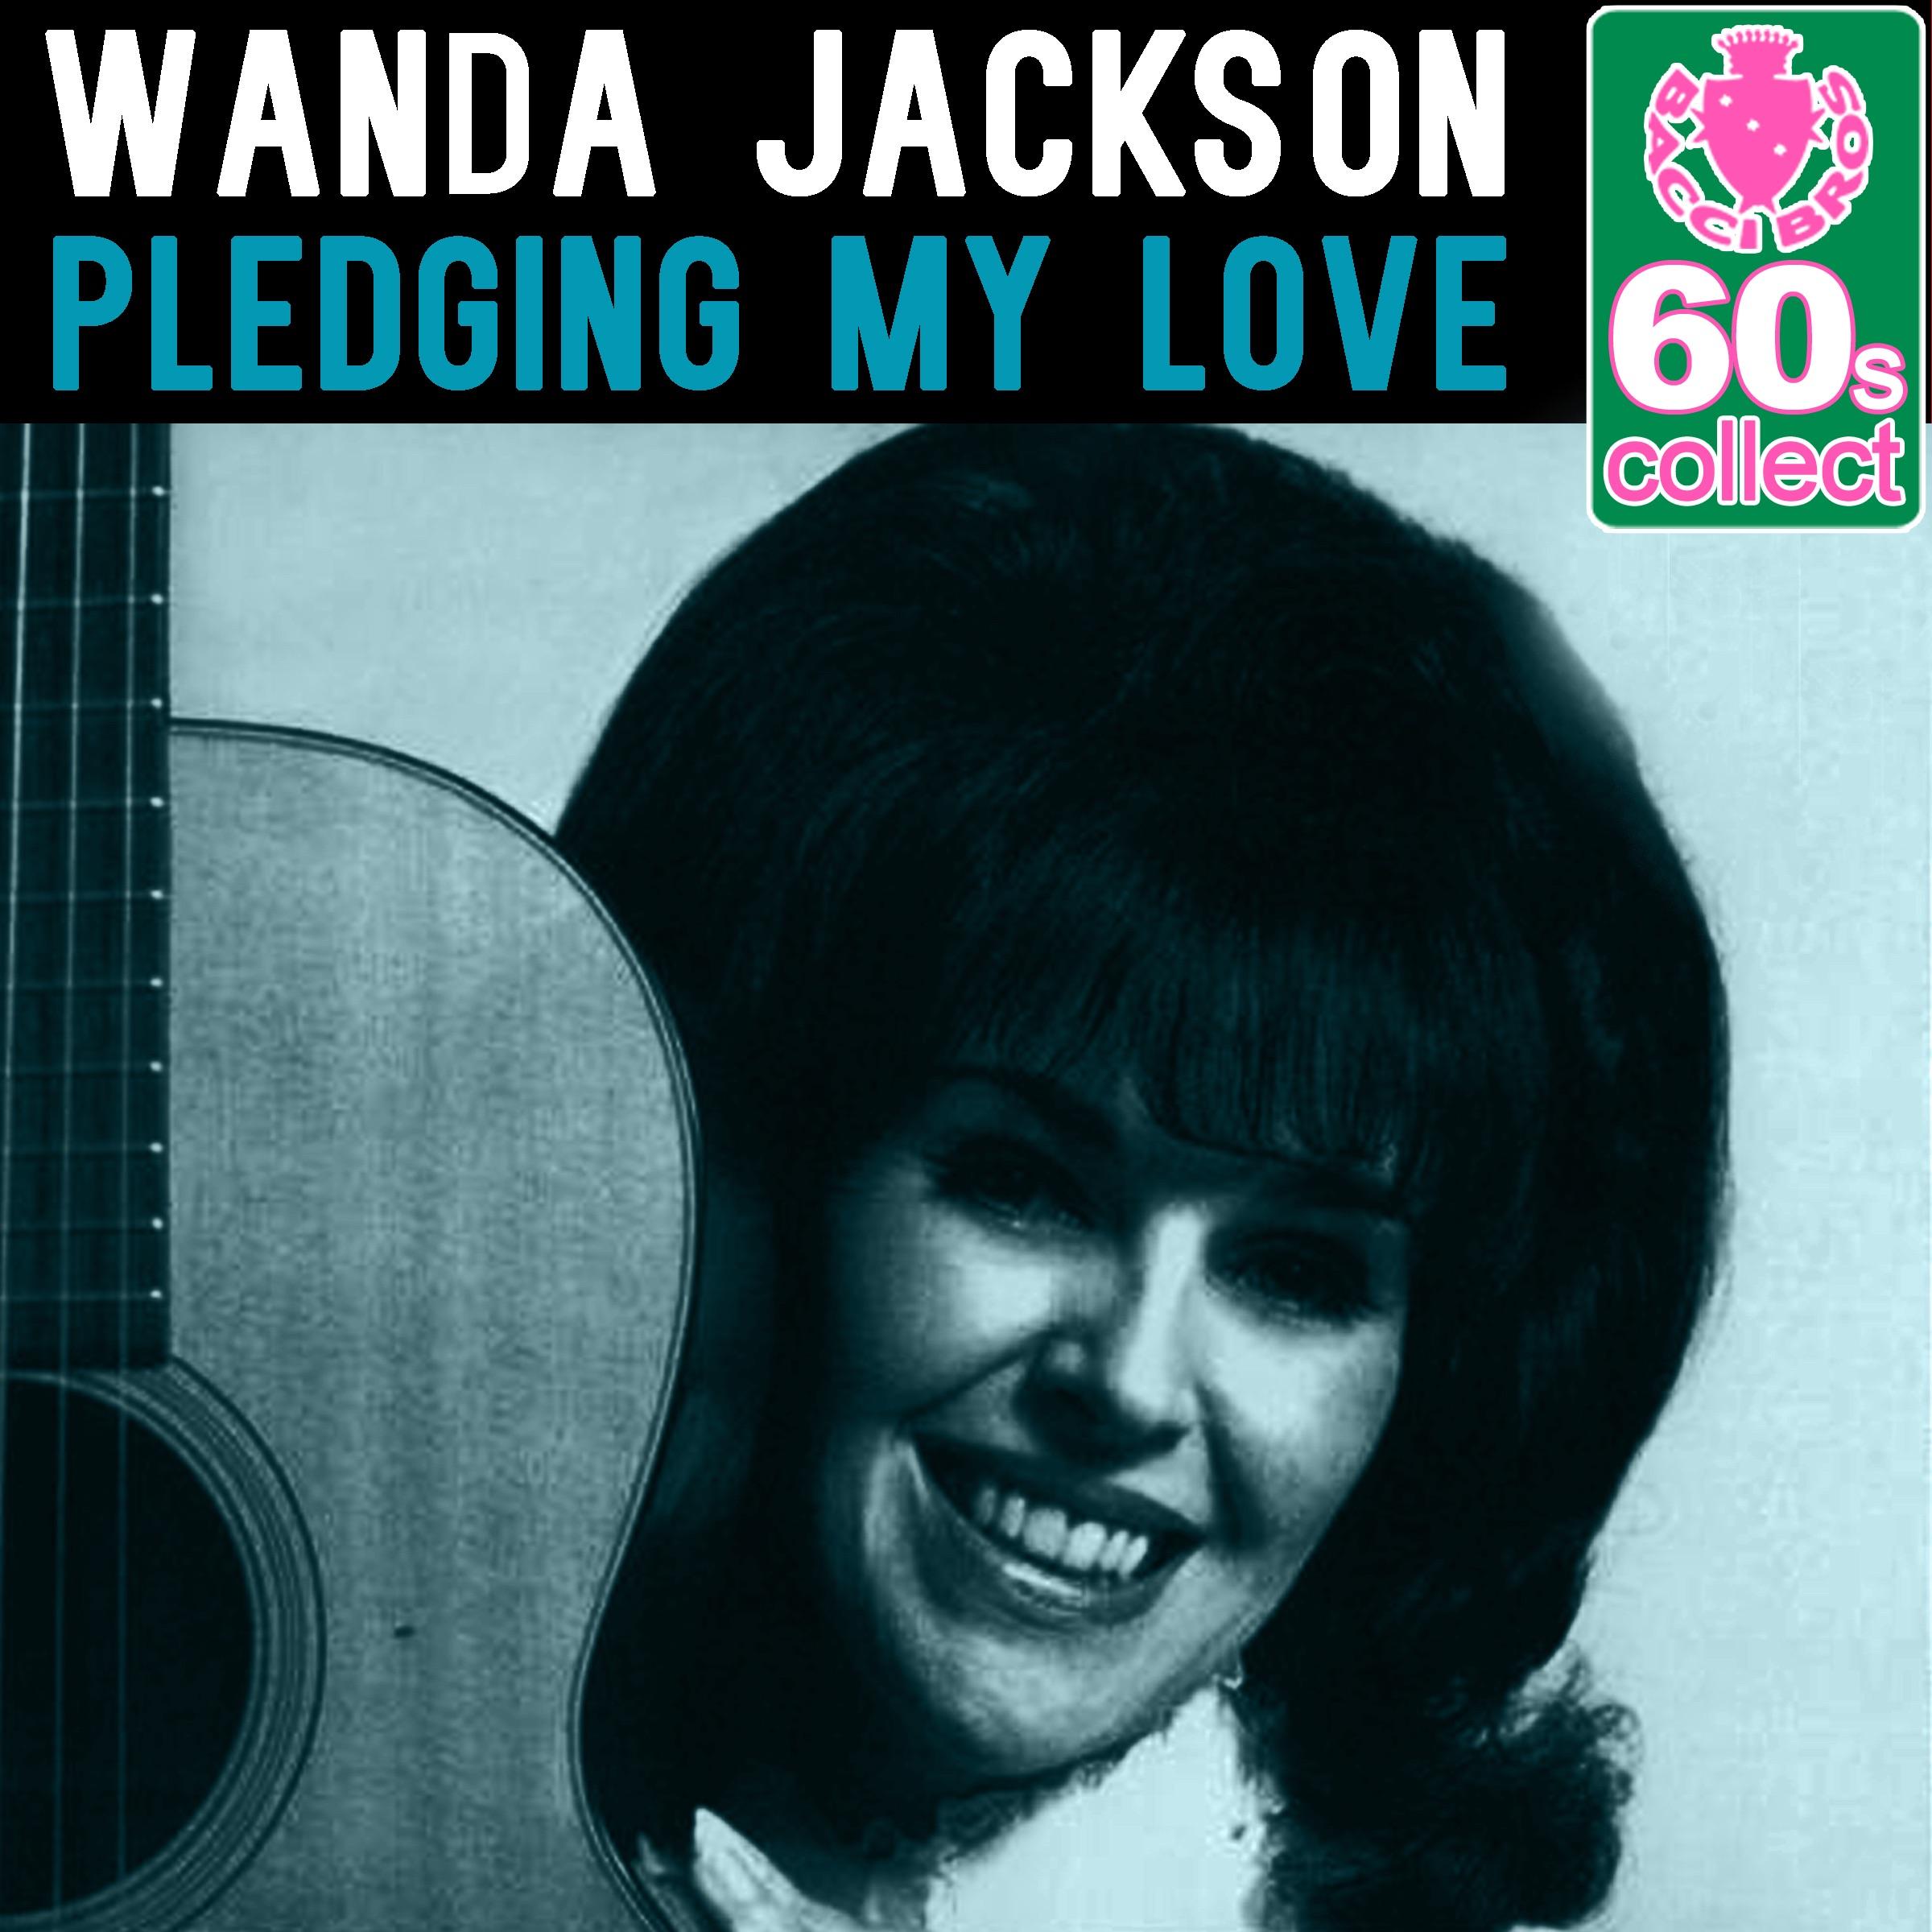 Pledging My Love (Remastered) - Single